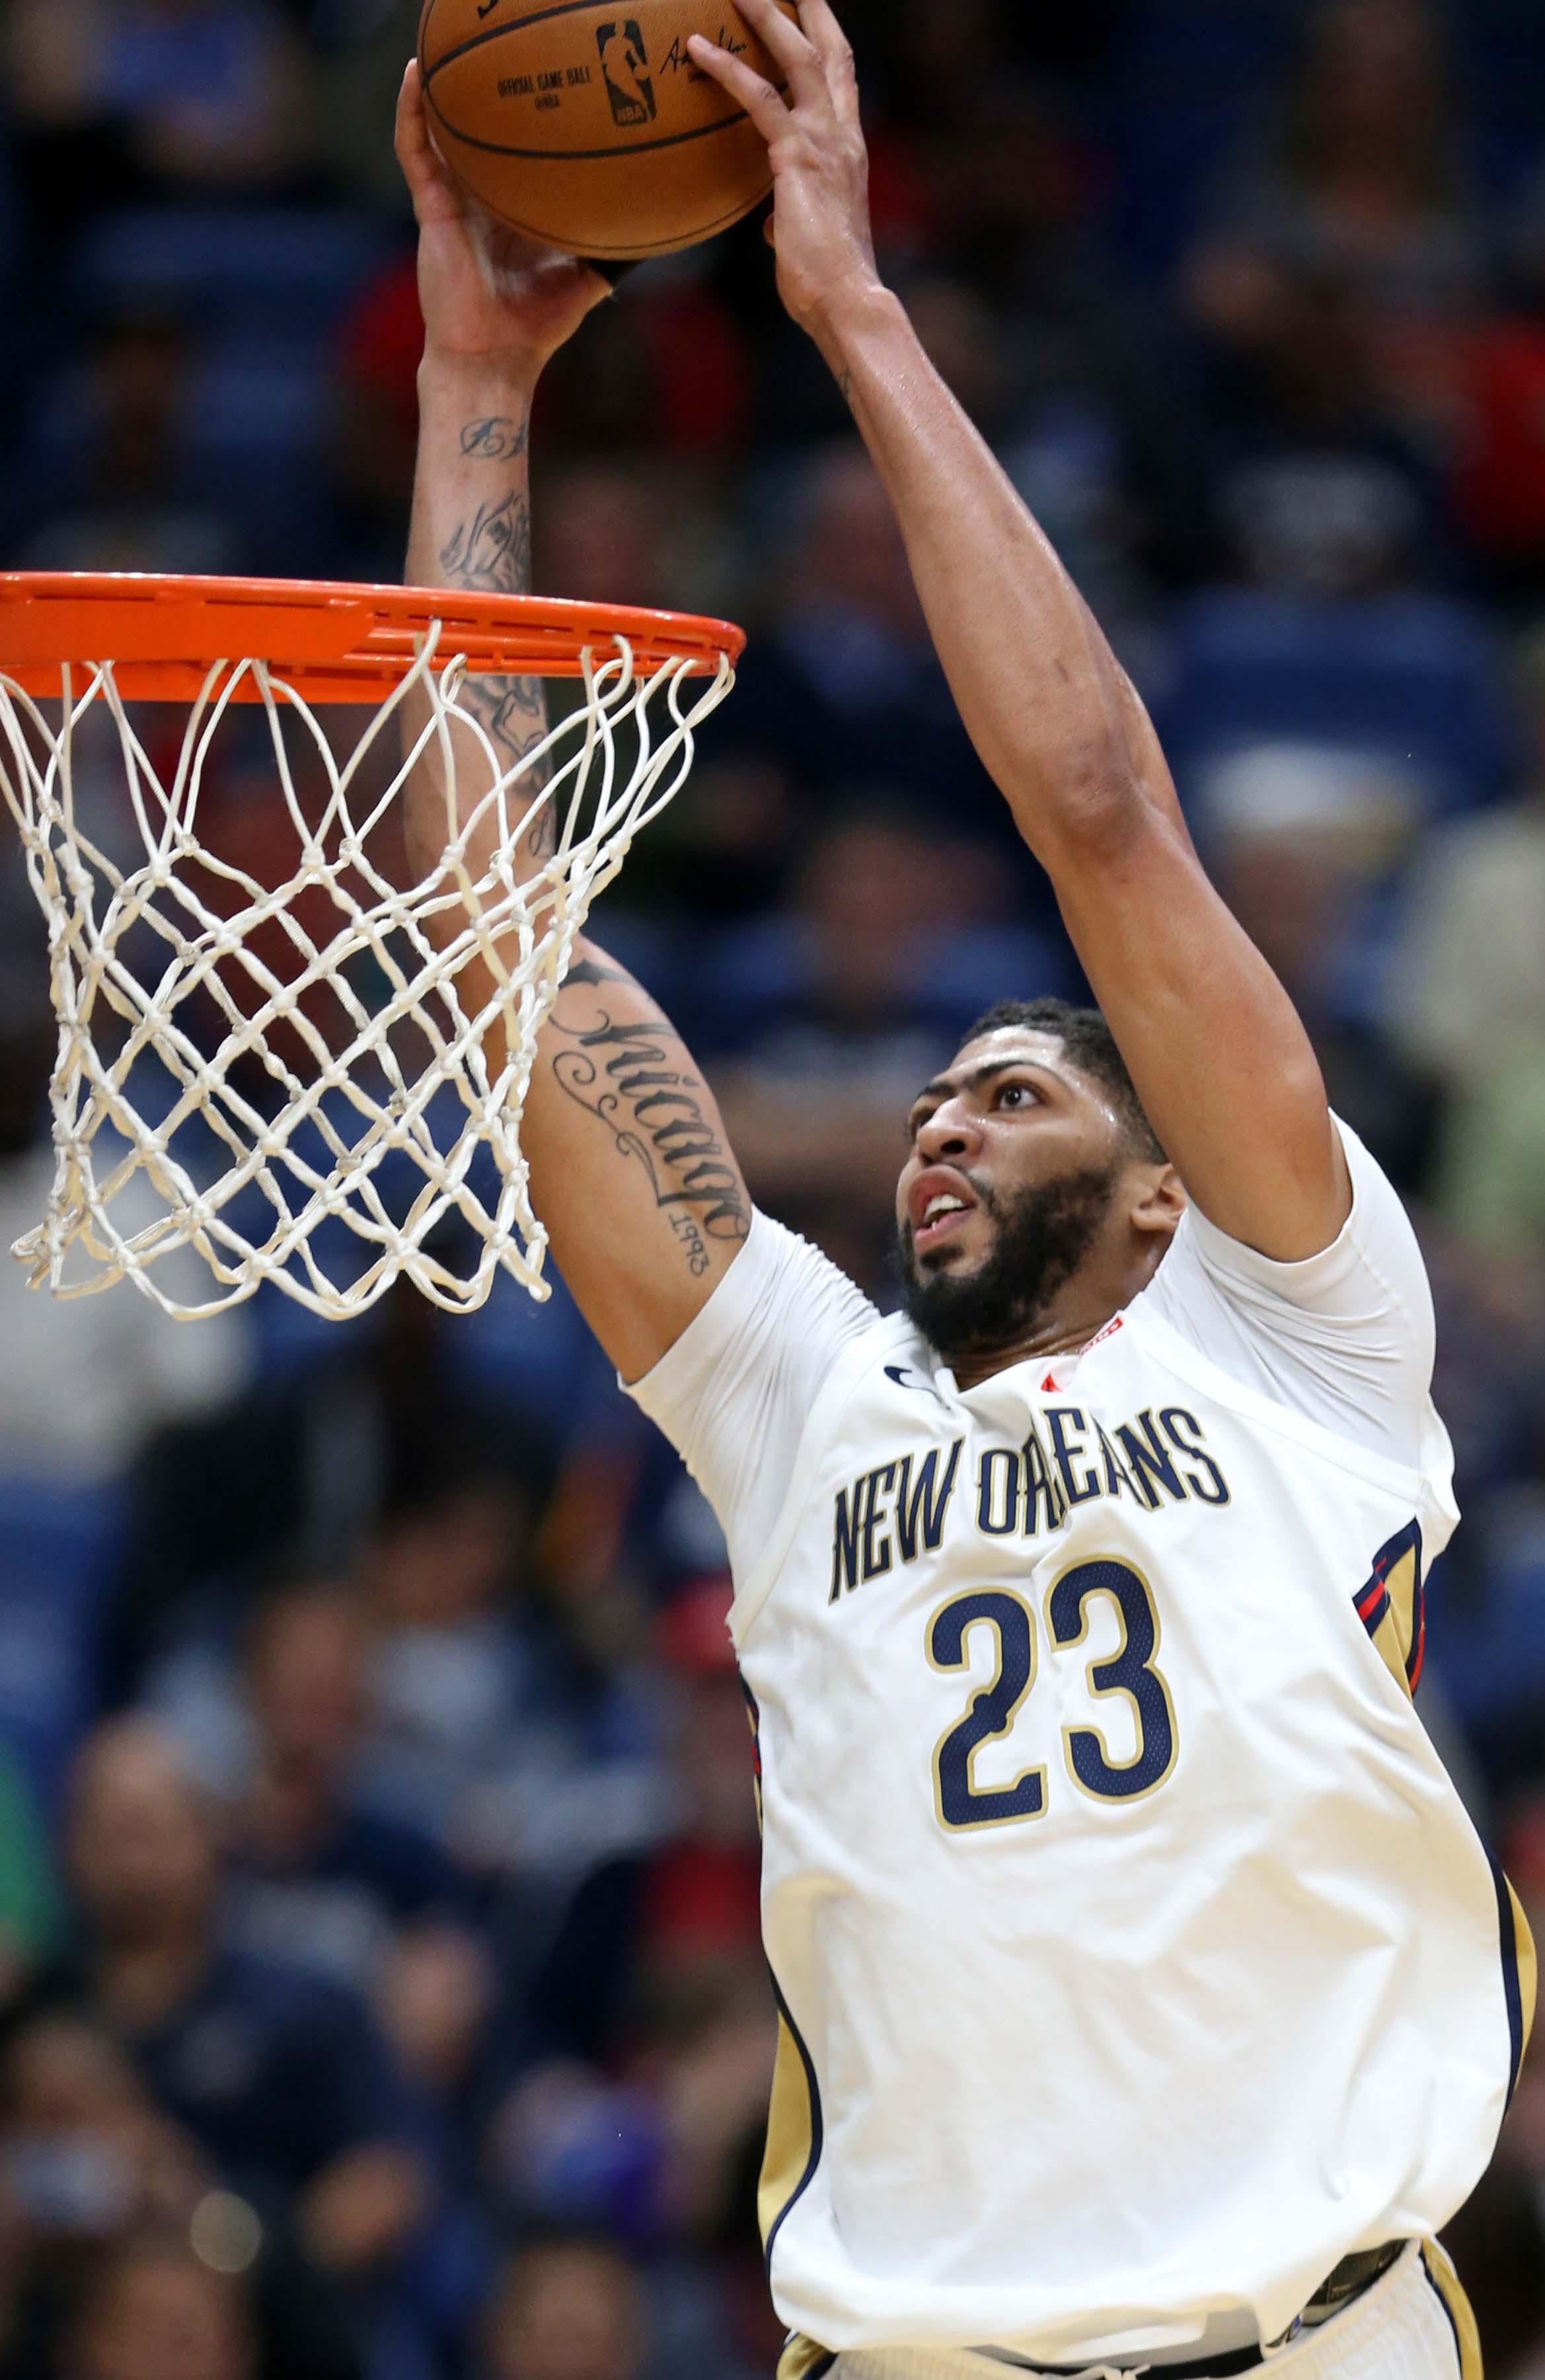 Pelican Post Game Report #153 Pelicans VS Phoenix Suns Recap/San Antonio Preview & More